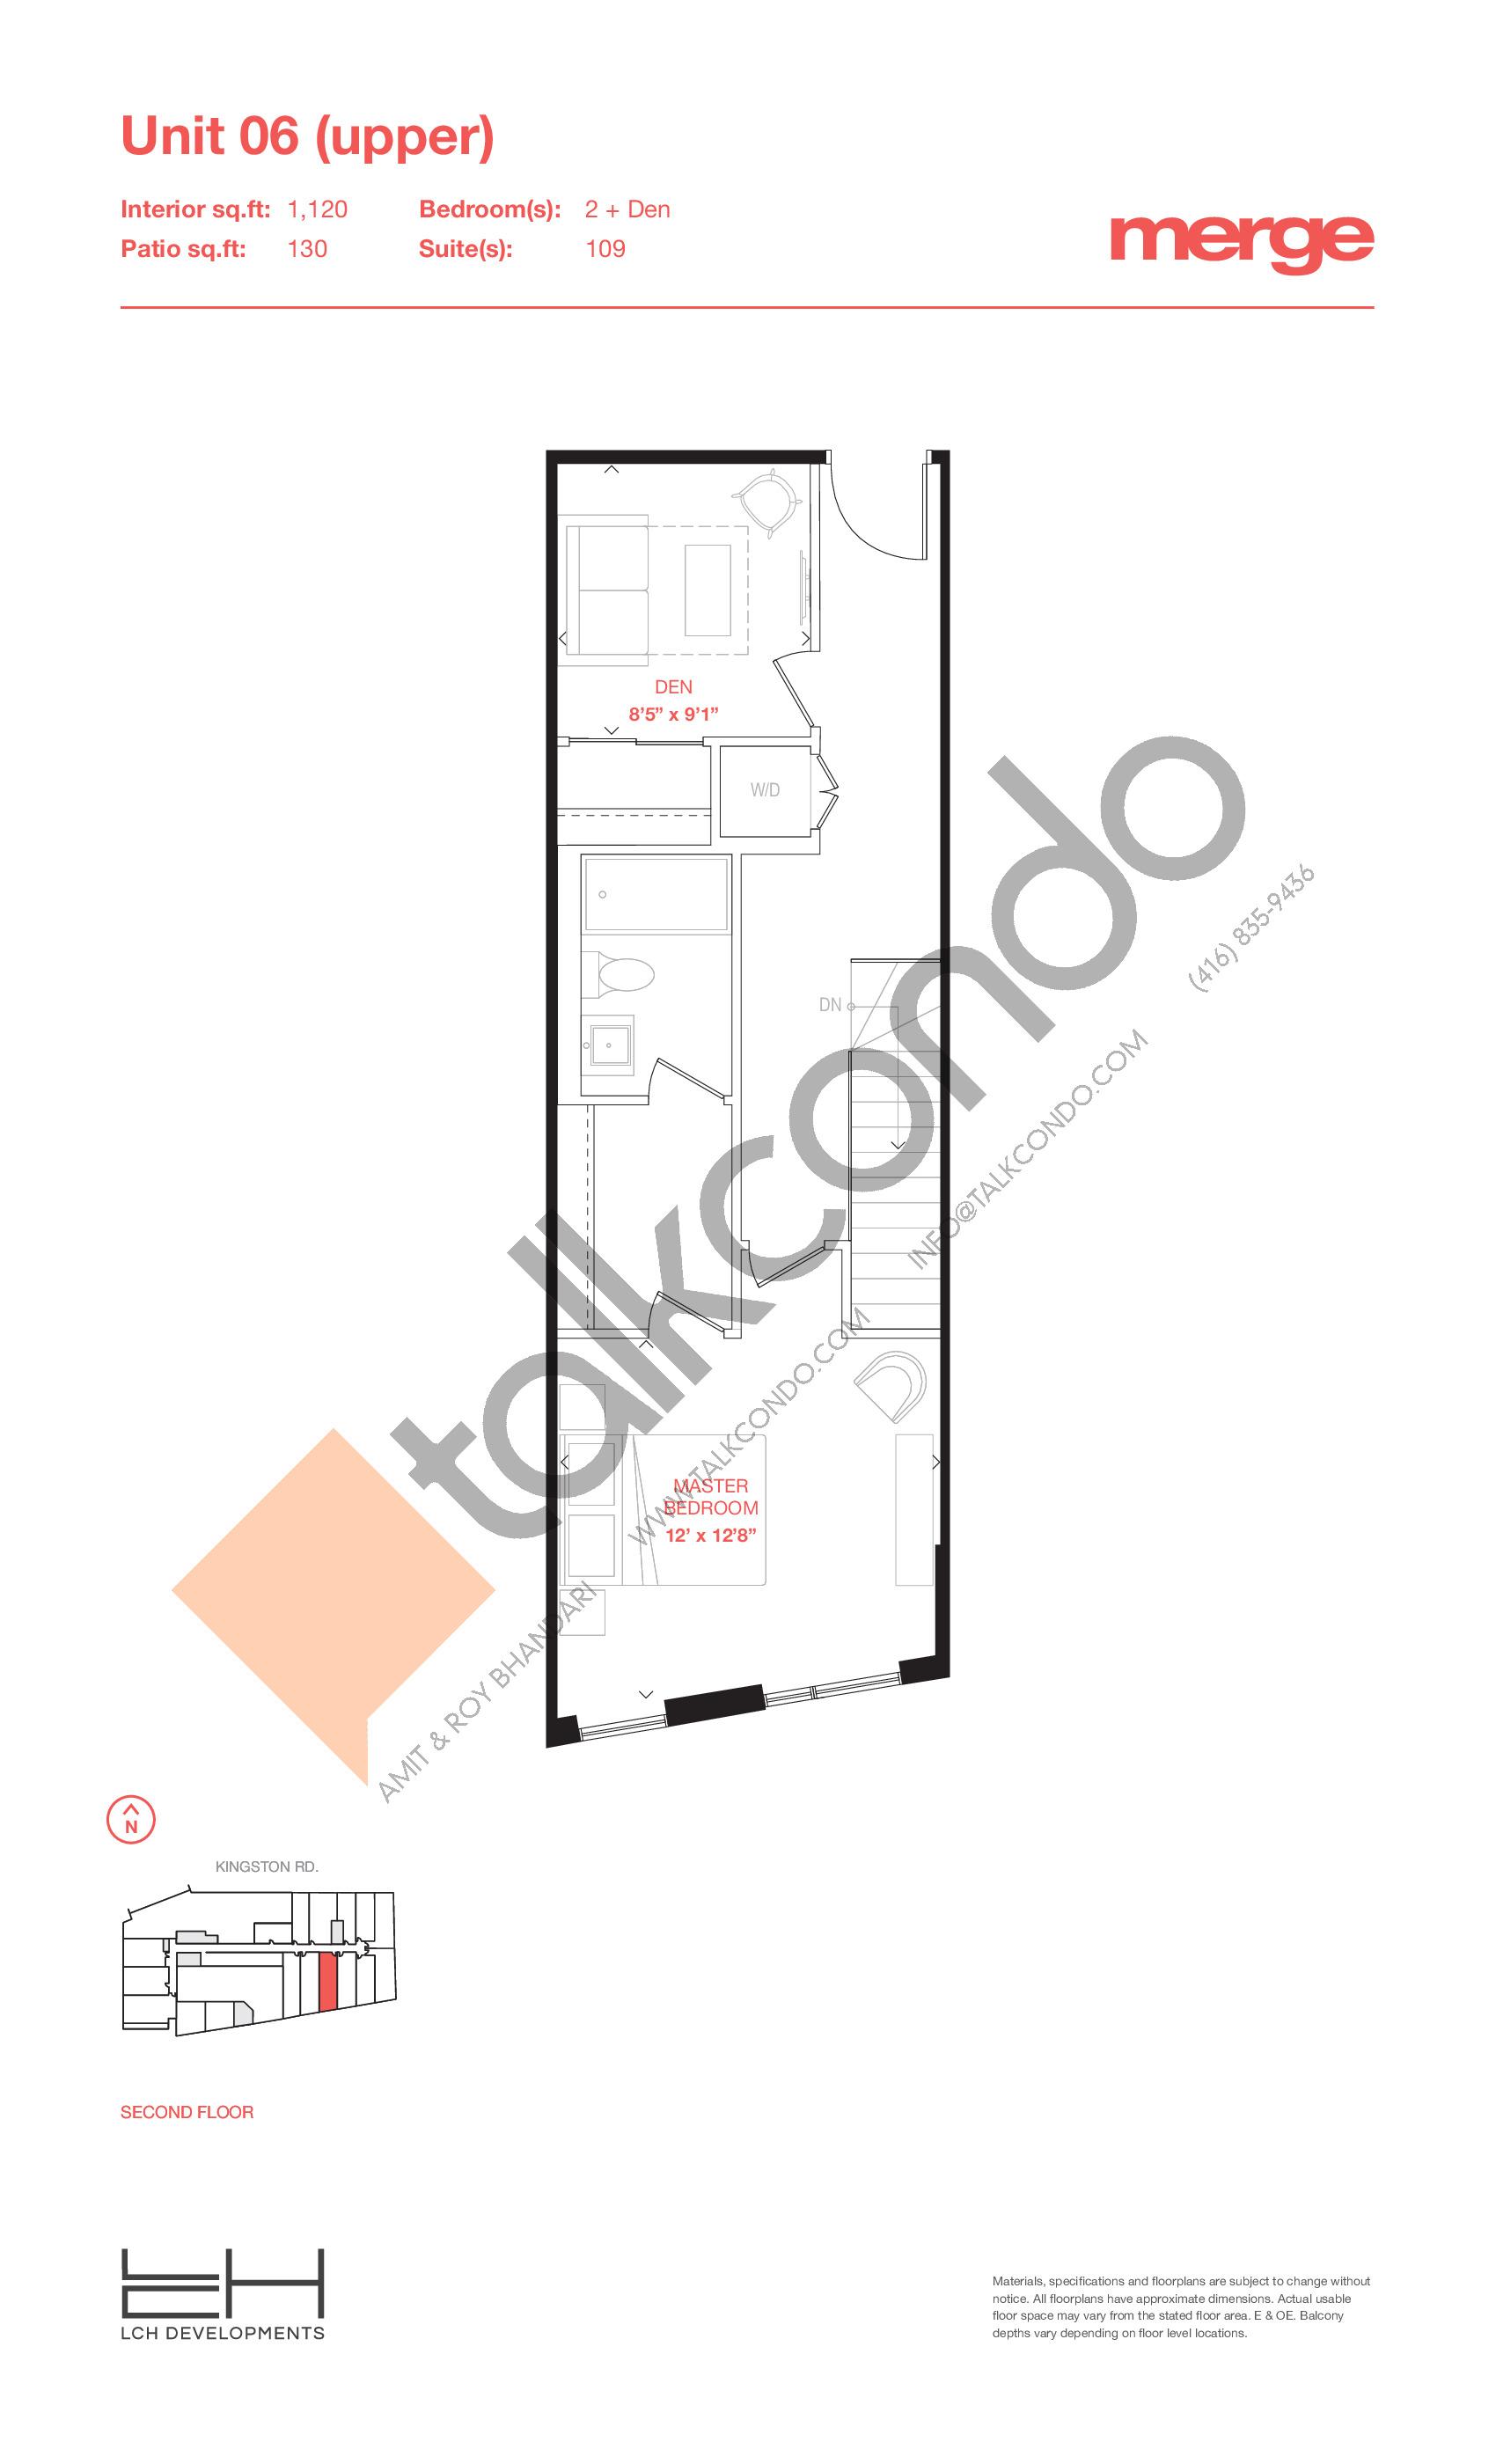 Unit 06 (Upper) - Townhouse Floor Plan at Merge Condos - 1120 sq.ft